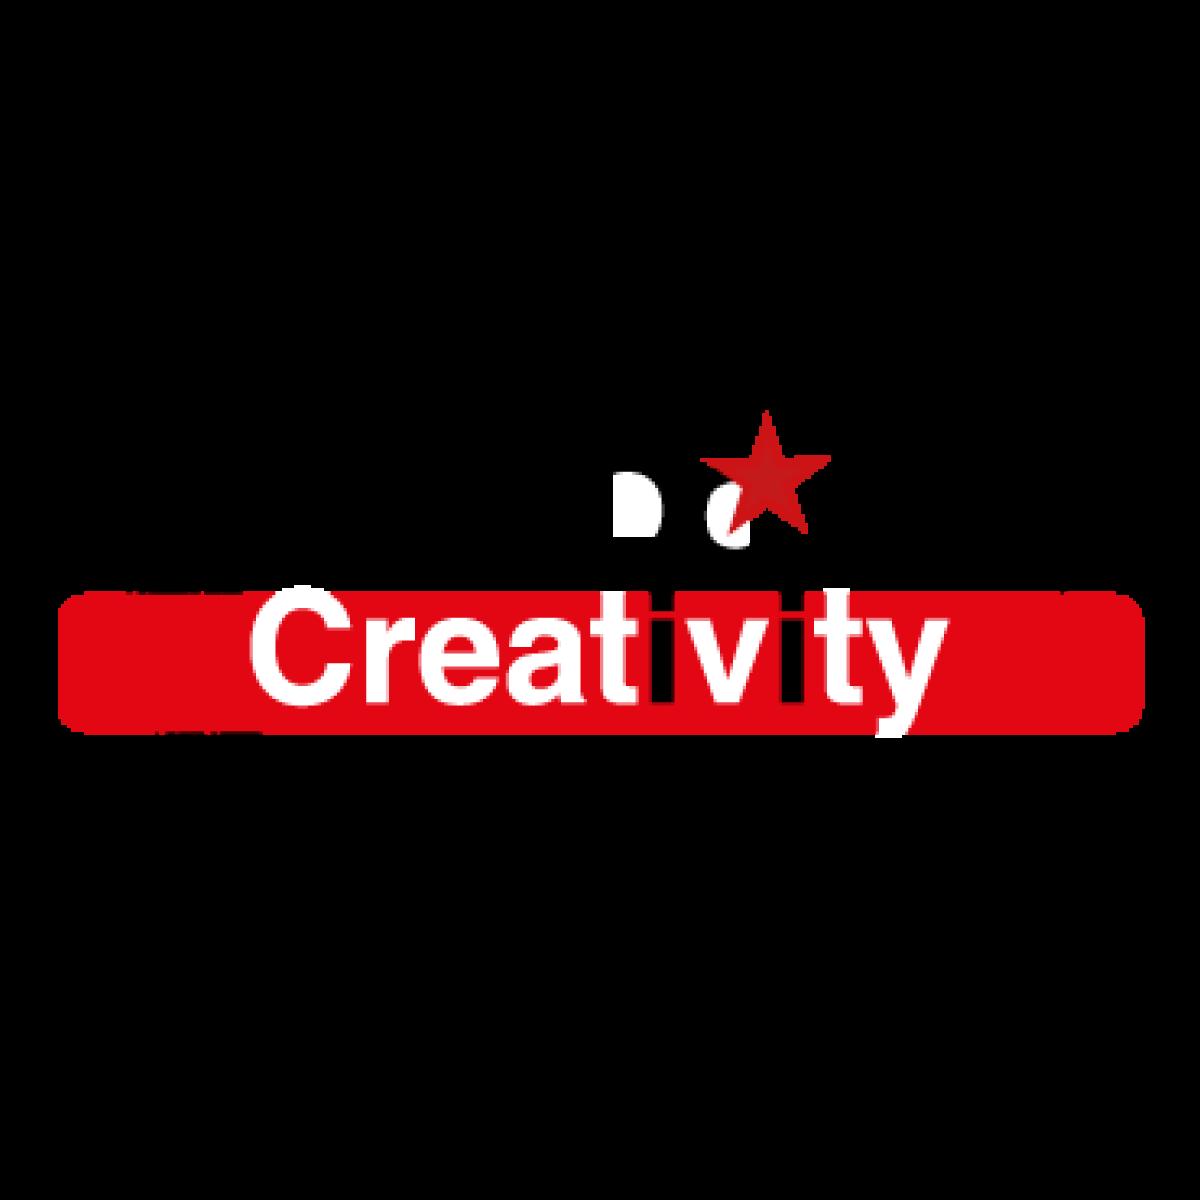 doc-creativity-logo_1.png